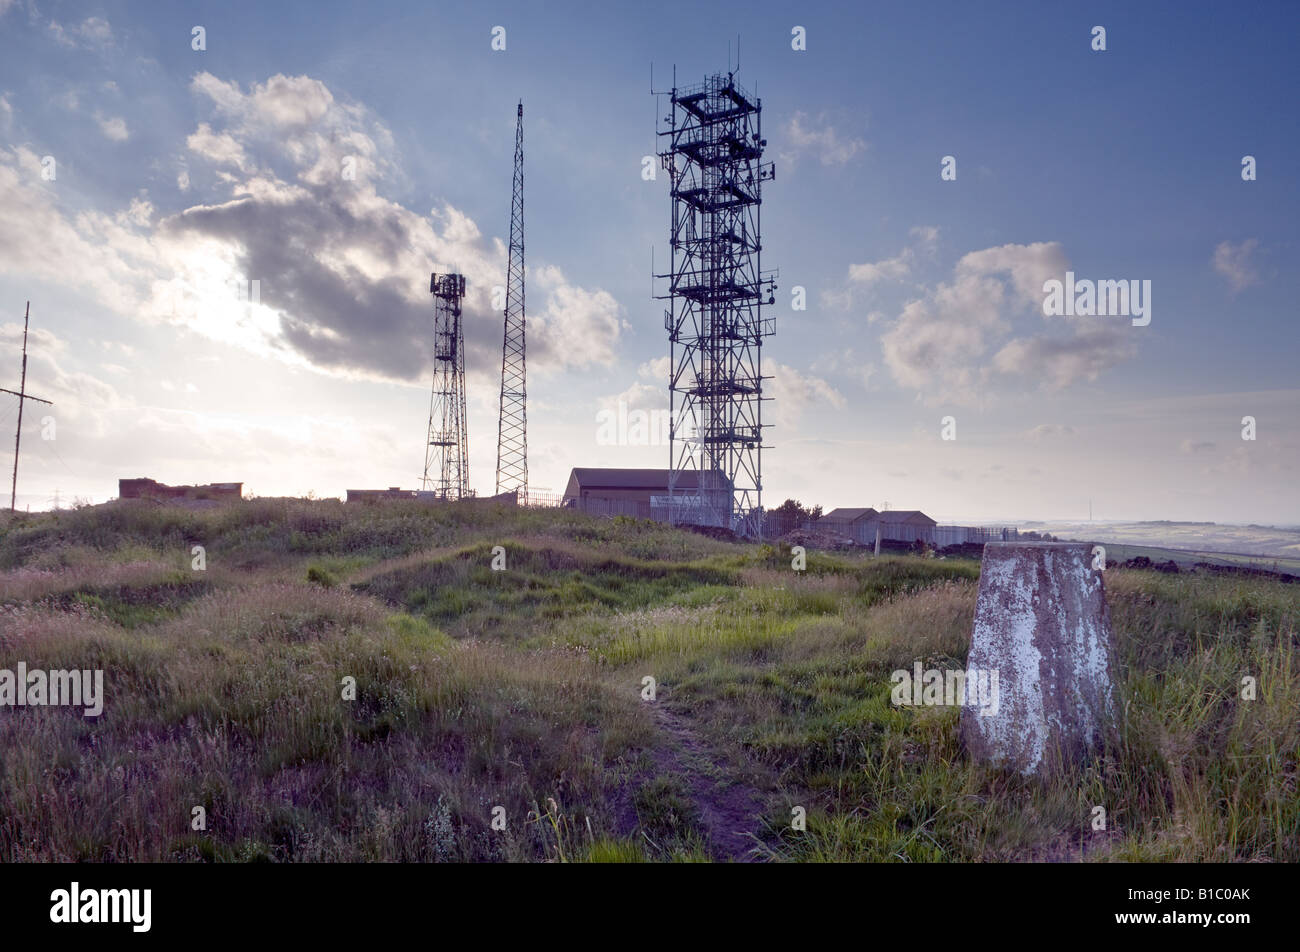 hunshelf-bank-transmission-masts-at-stoc